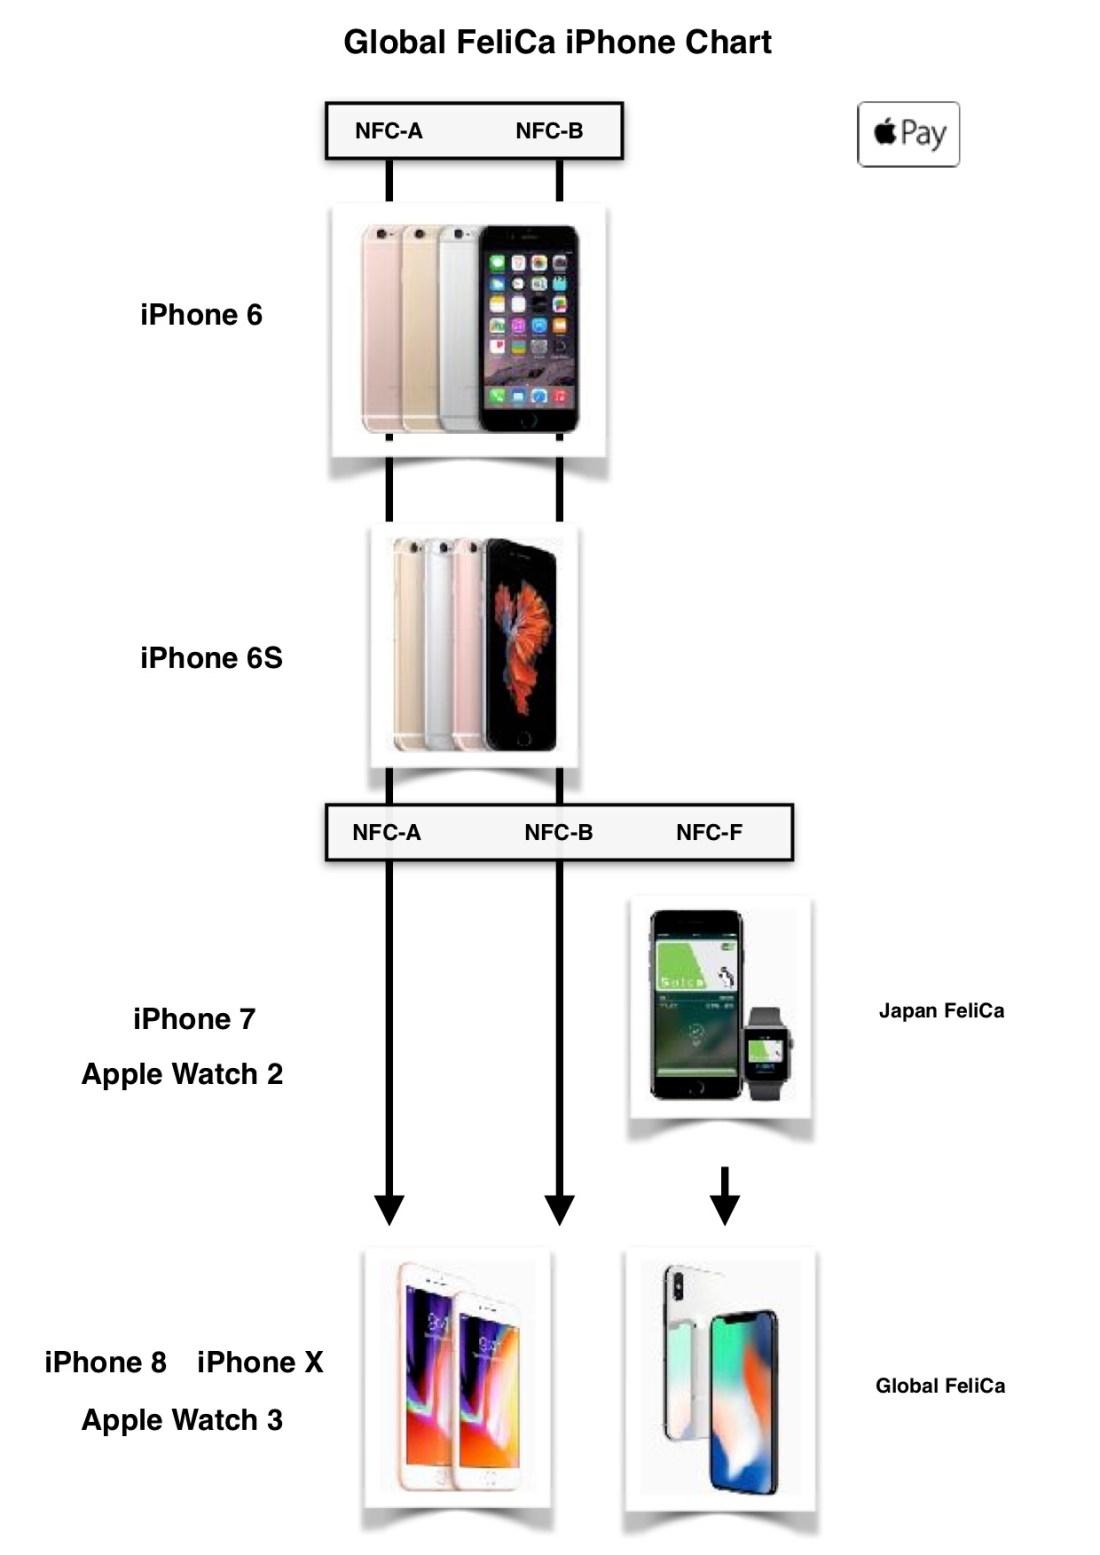 Apple Pay Global FeliCa iPhone Chart